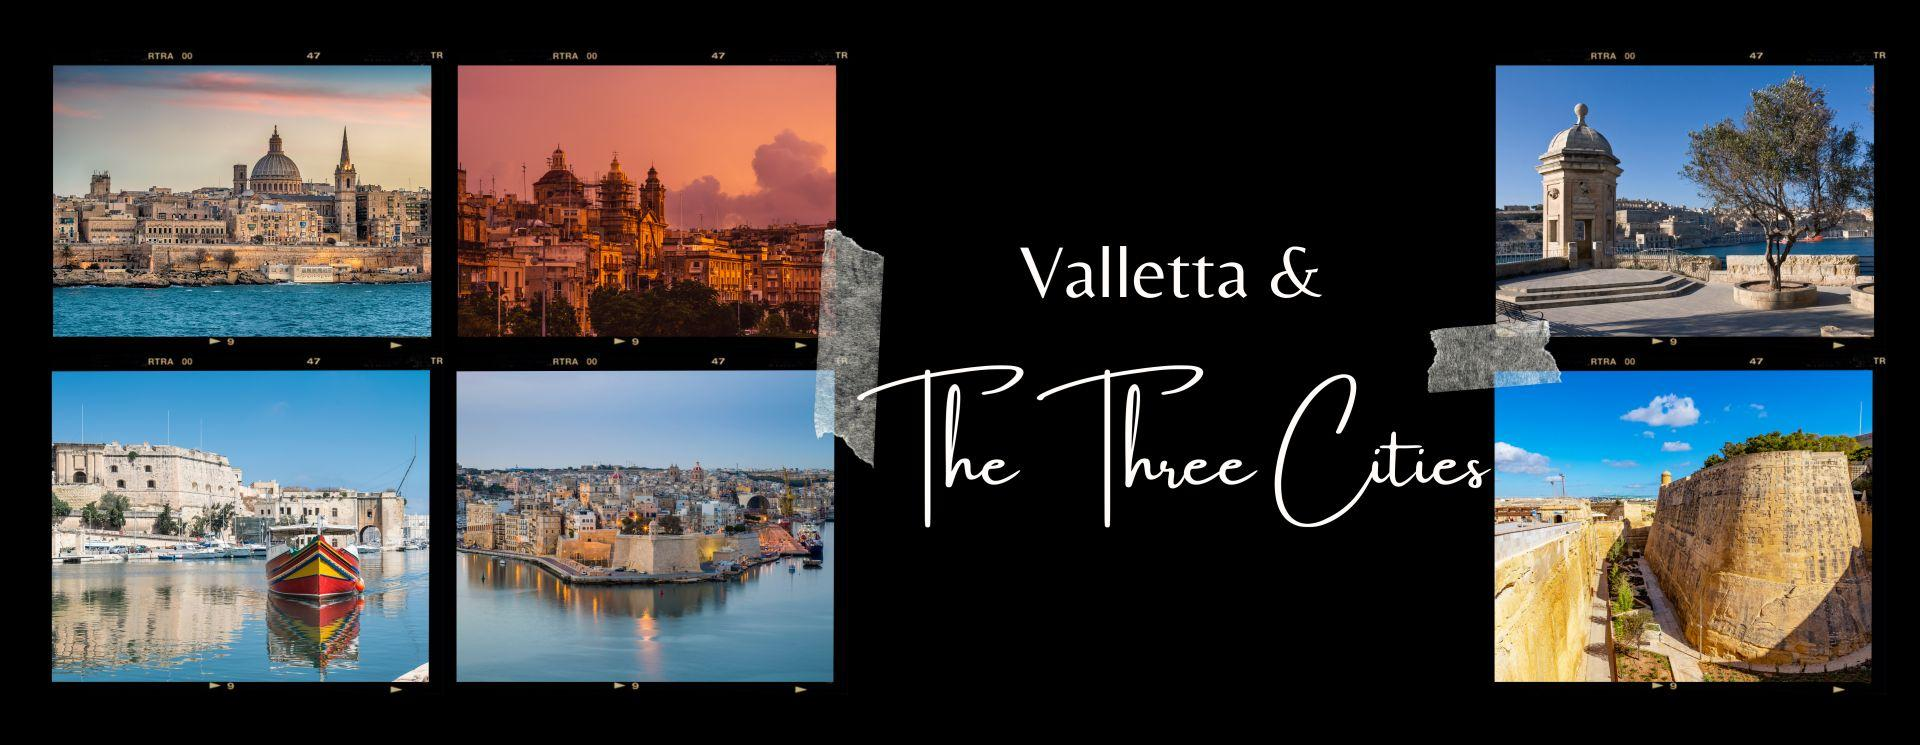 Tour Malta by taxi